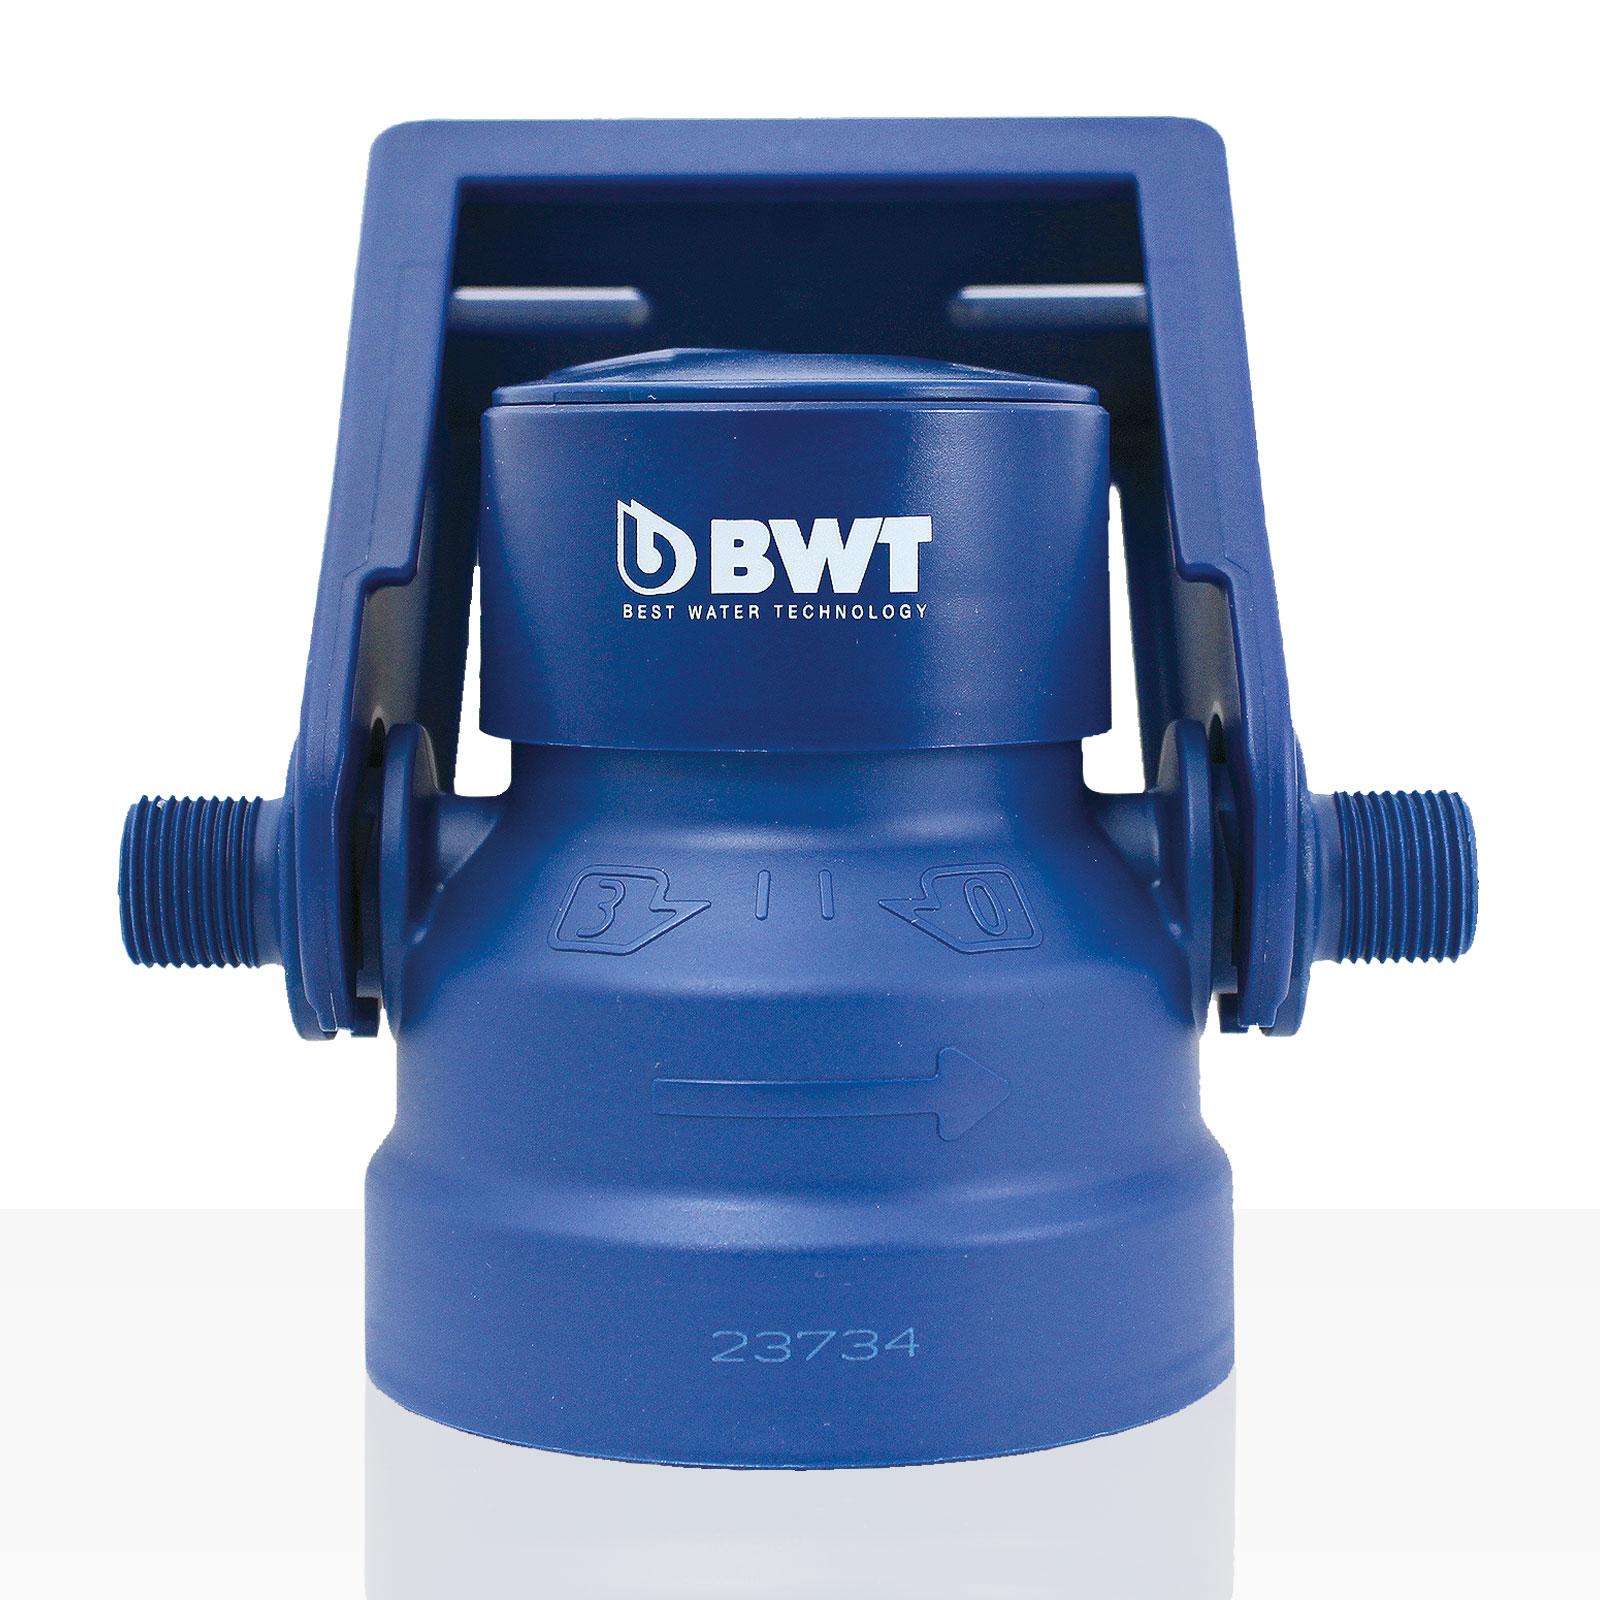 BWT Besthead Filterkopf water + more, Universalfilterkopf für alle BWT Filterkerzen, 3/8